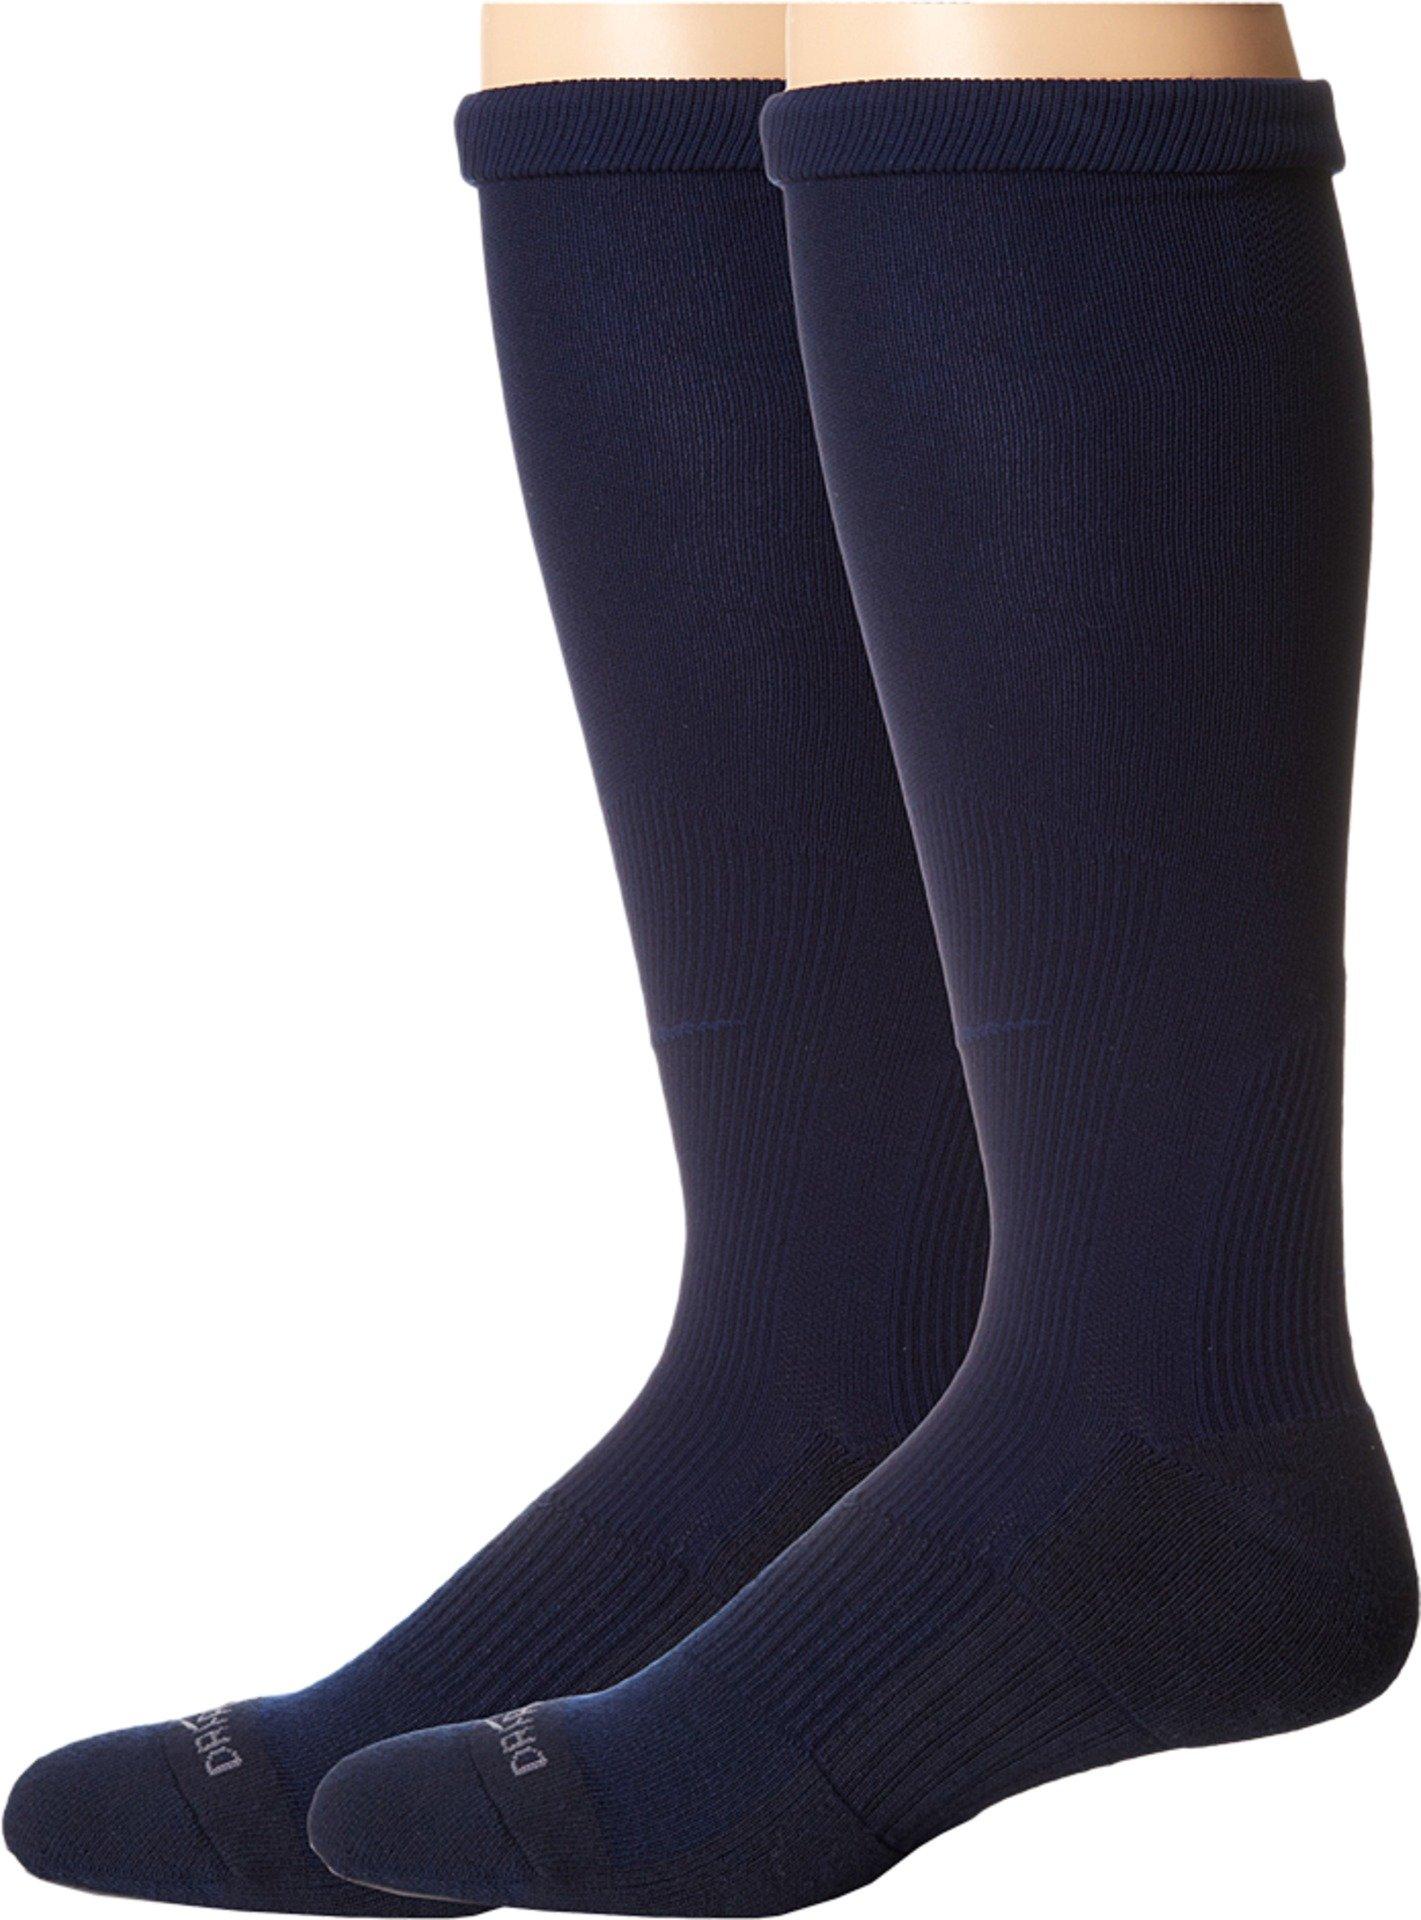 Nike Performance Knee-High Baseball Sock College Navy Size Medium by Nike